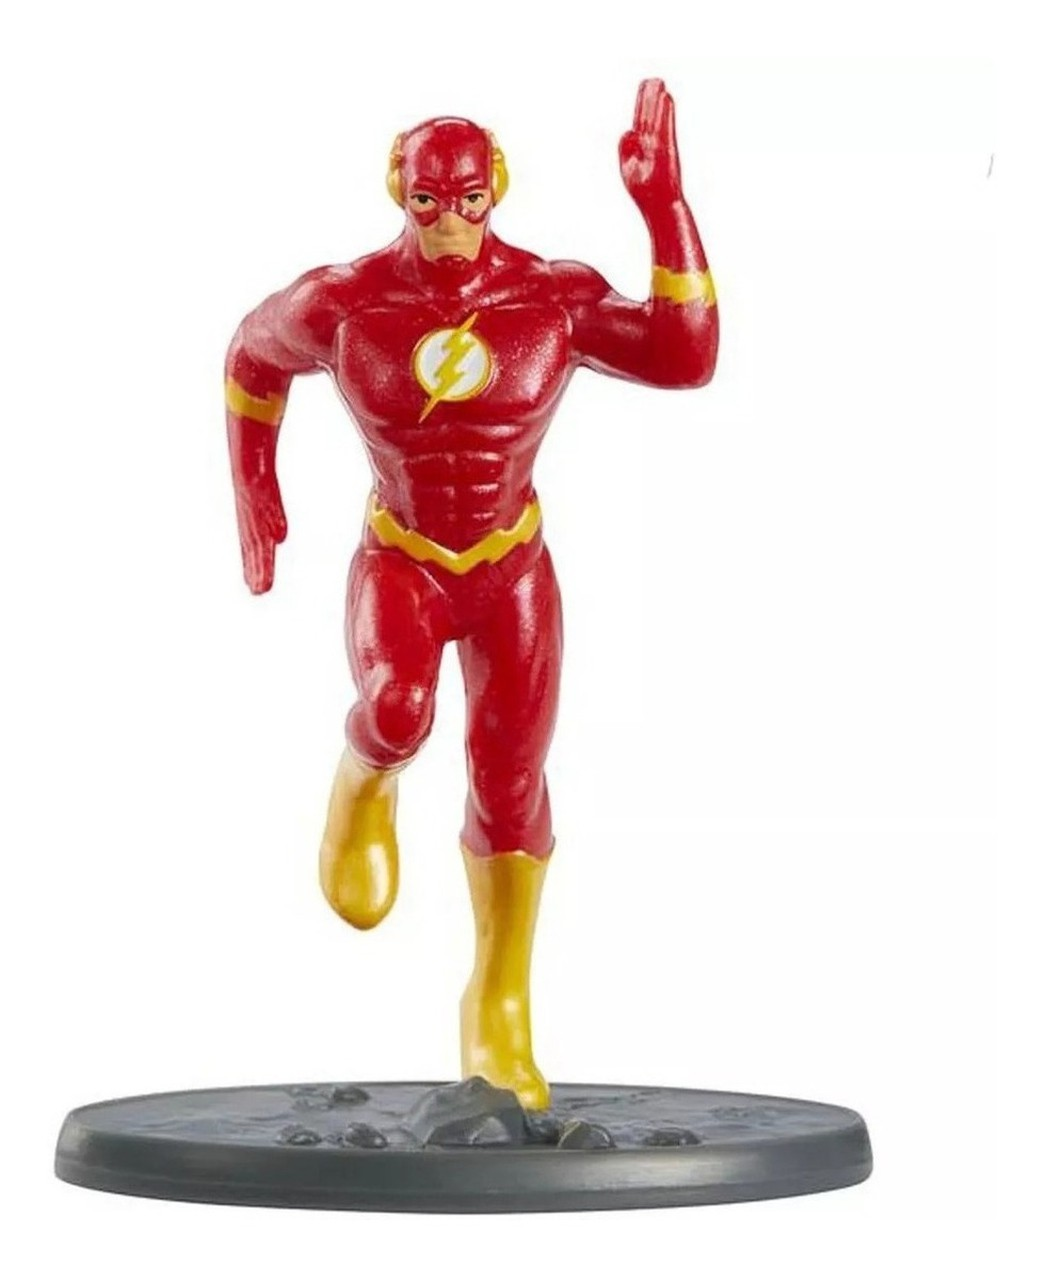 Boneco Flash Miniatura Liga Da Justiça - Mattel